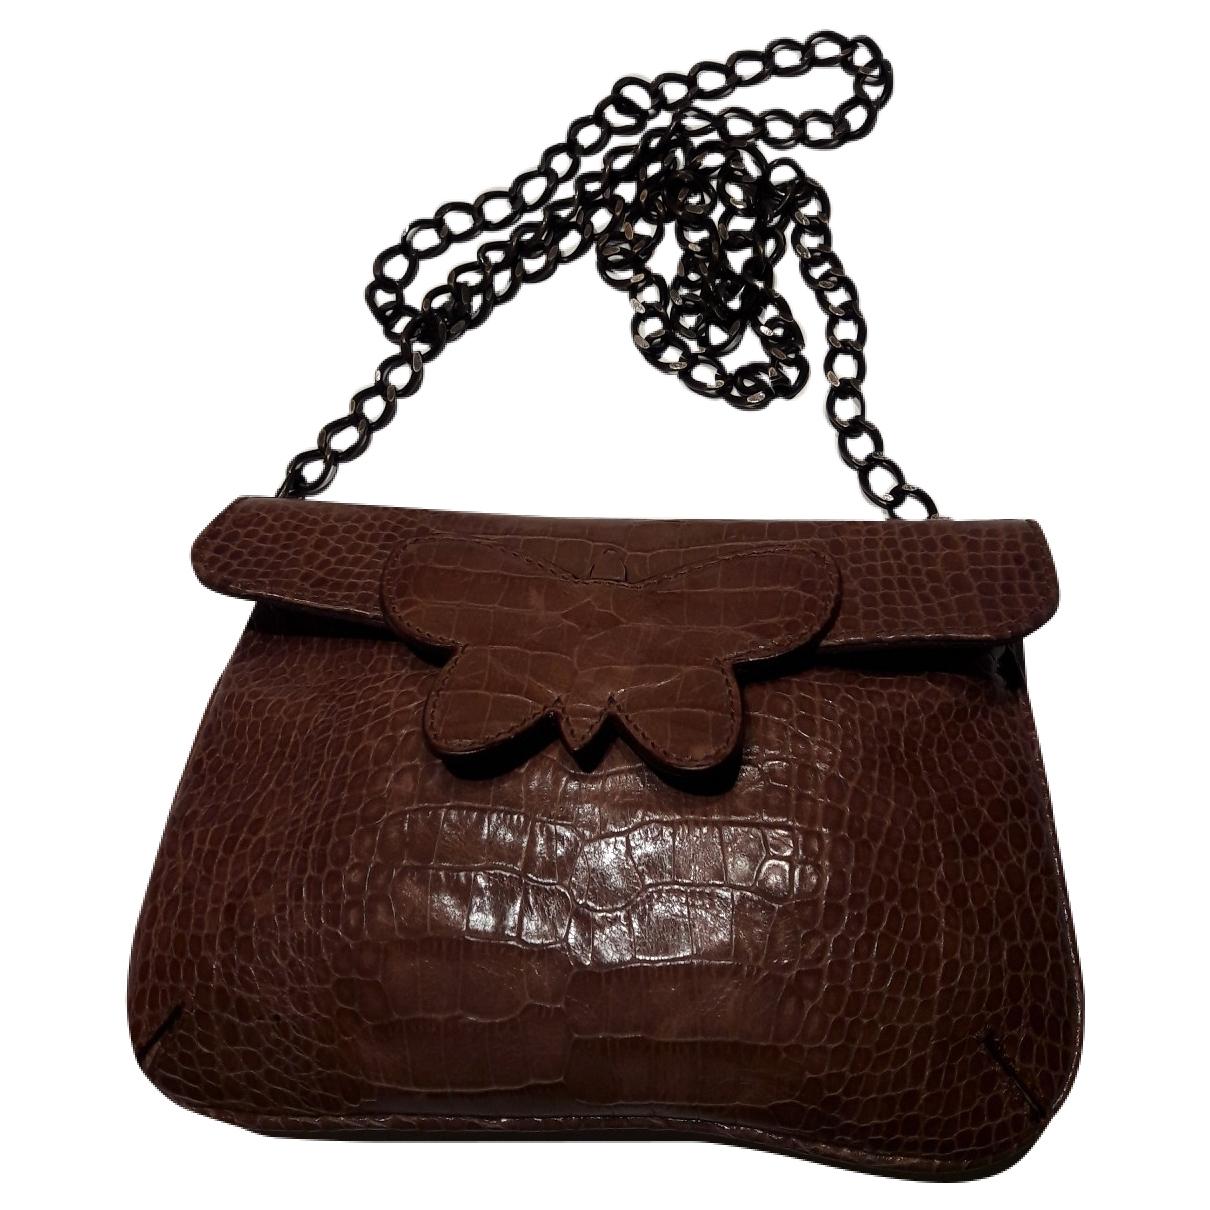 Max Mara \N Camel Leather handbag for Women \N